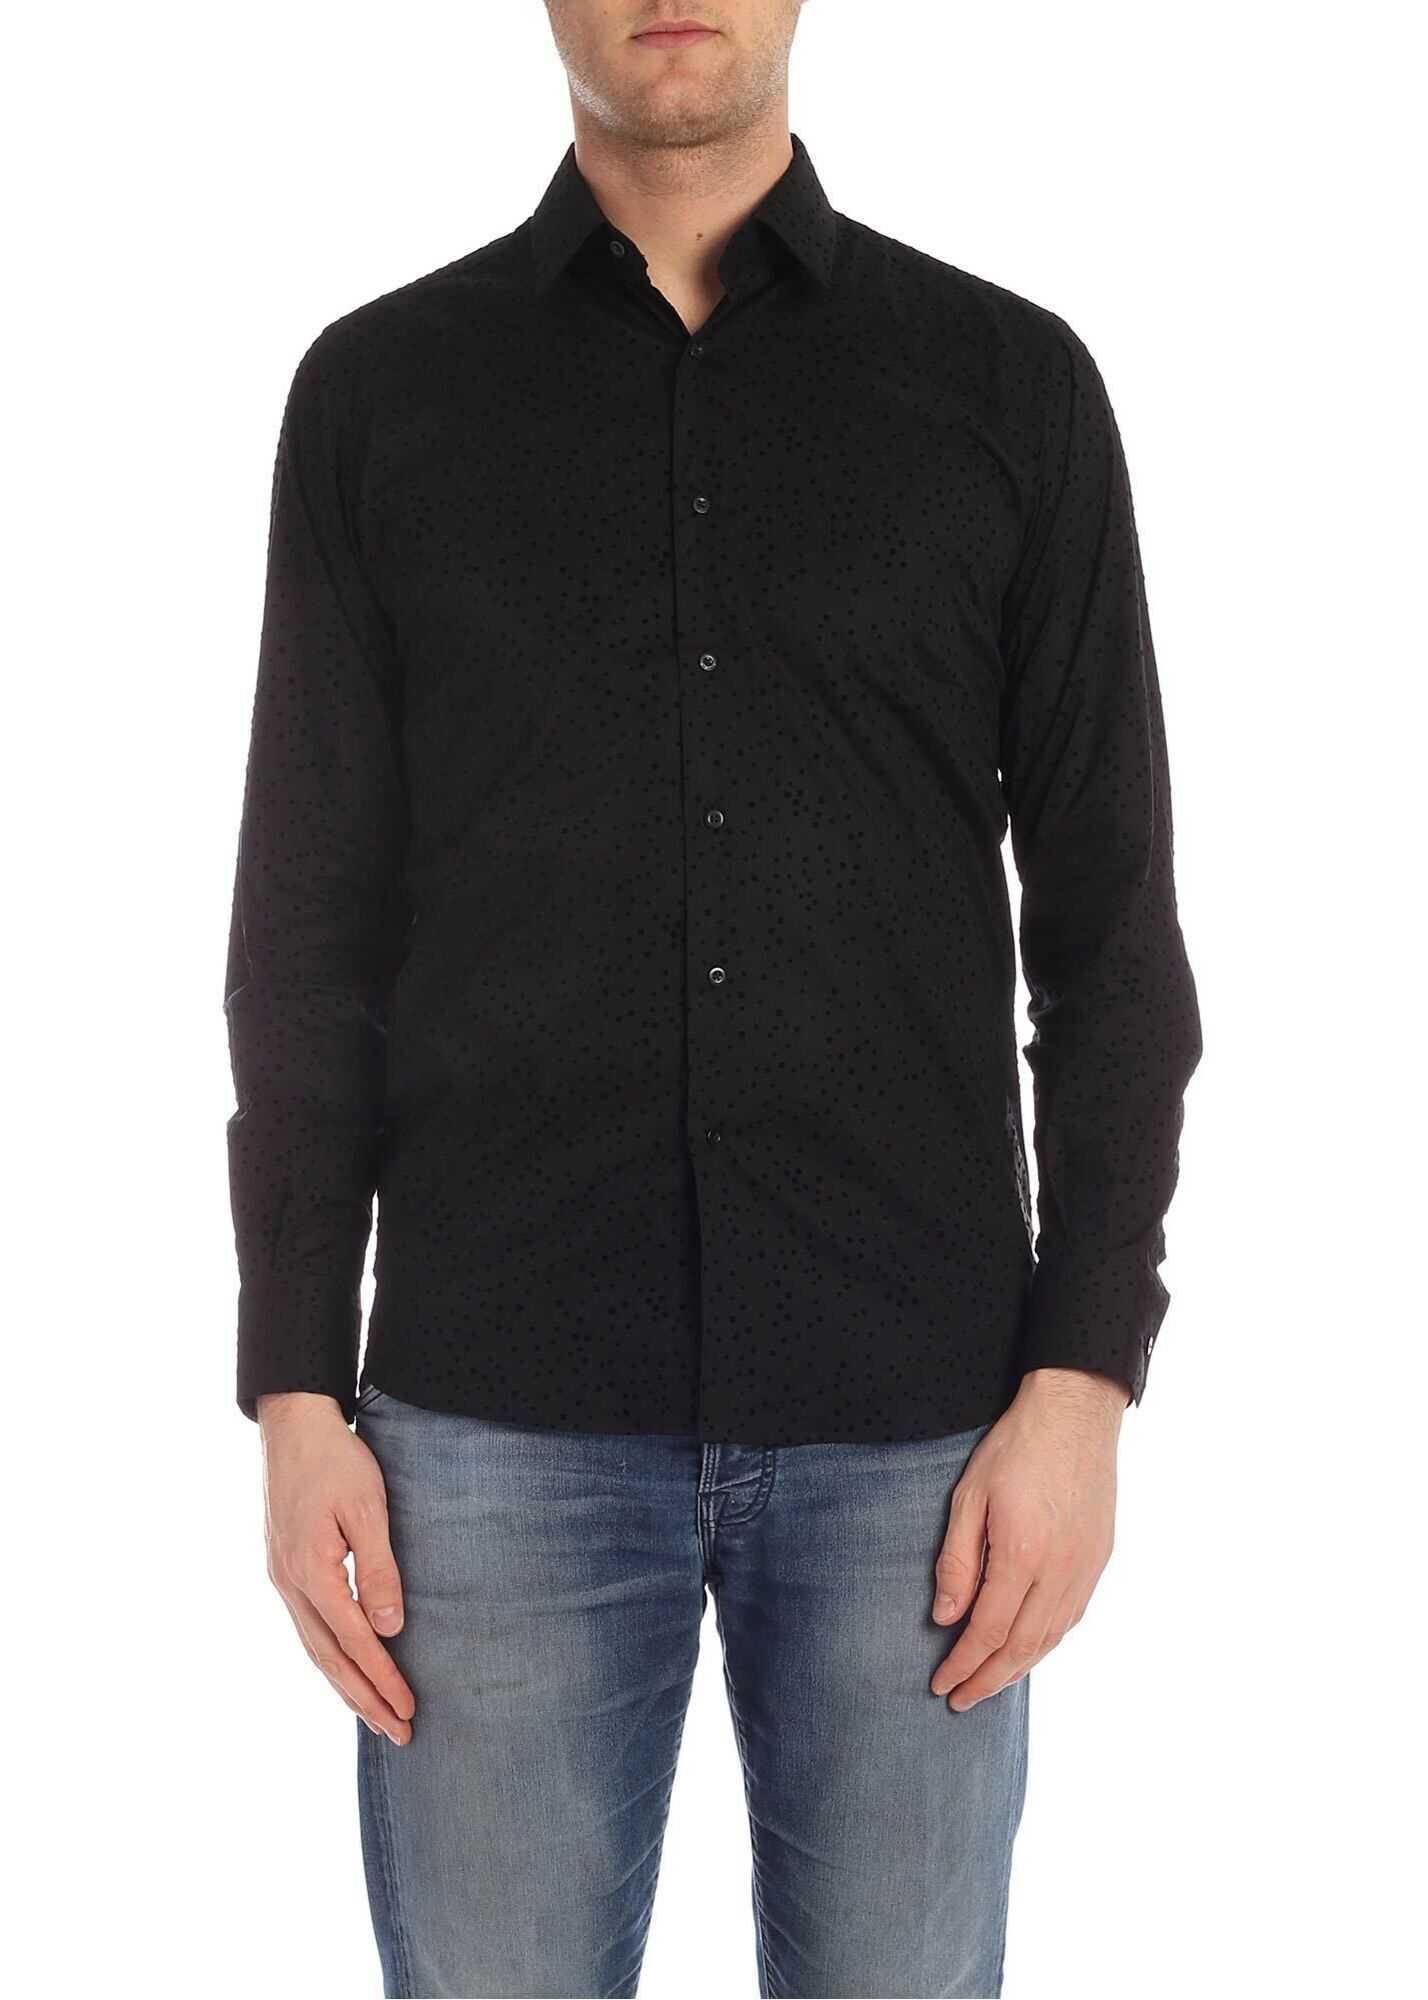 Flock Polka Dot Shirt In Black thumbnail